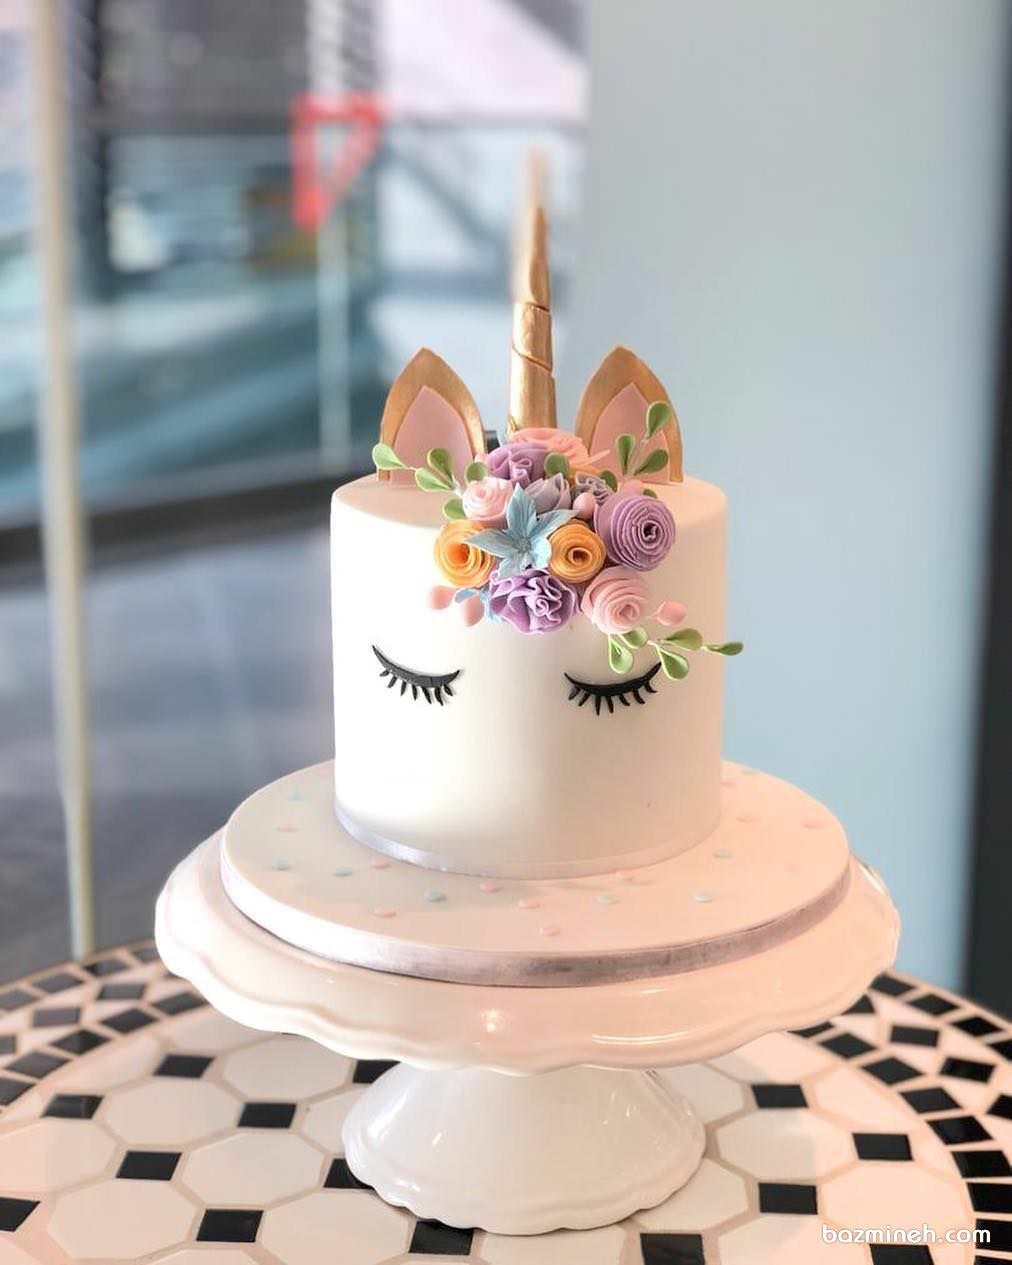 مینی کیک رویایی جشن تولد کودک با تم یونیکورن (اسب تک شاخ)